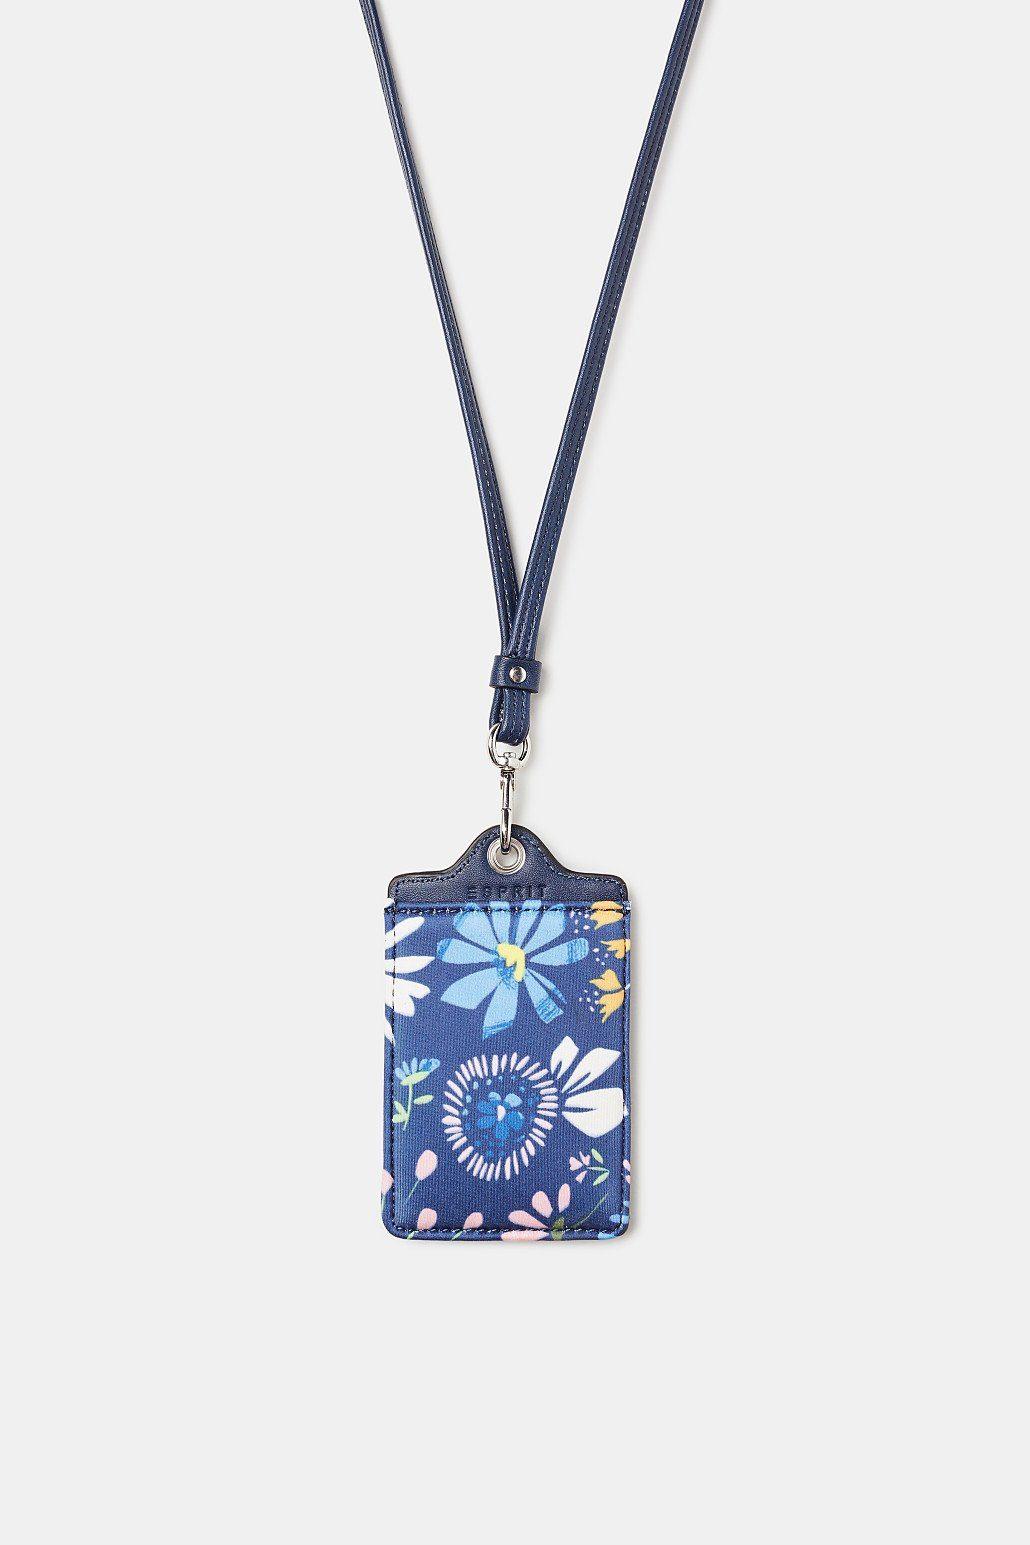 ESPRIT Gepäckanhänger mit floralem Allover-Print